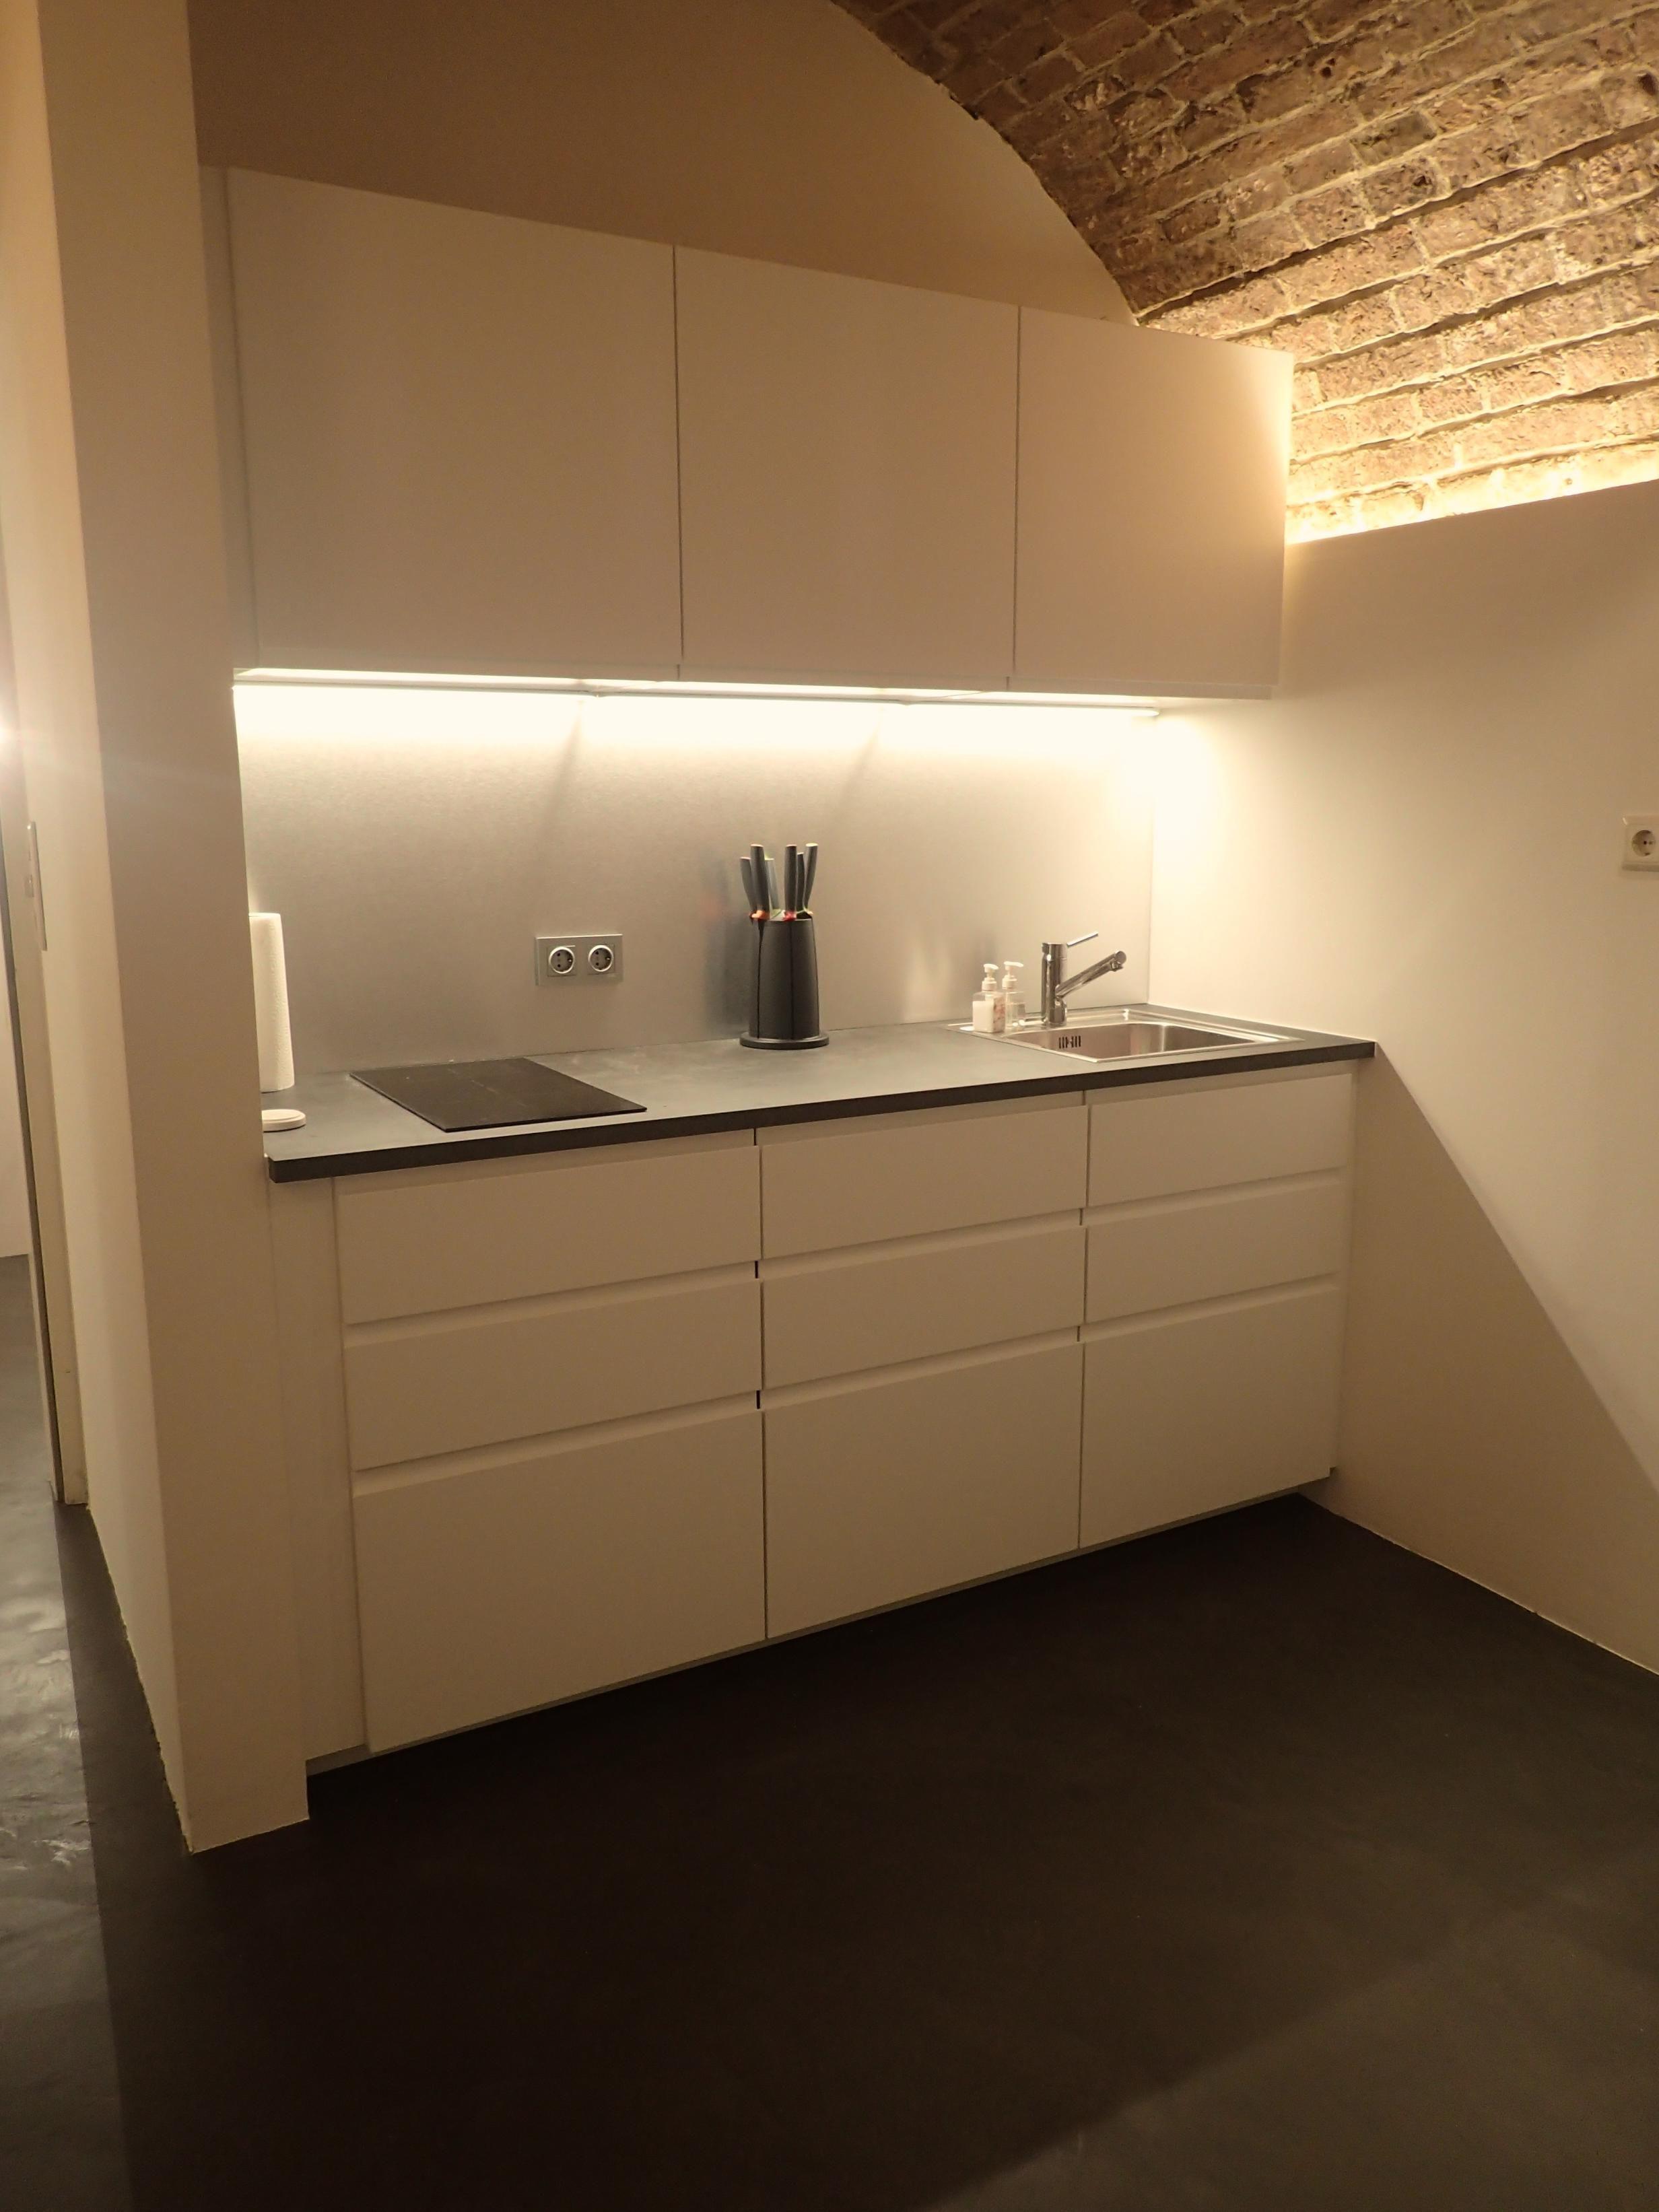 Boden Béton CIré Original in einer Küche. Farbe 32 Anhtracit. www.betoncire.at #betoncireoriginal #betoncire #betonboden #betonlook